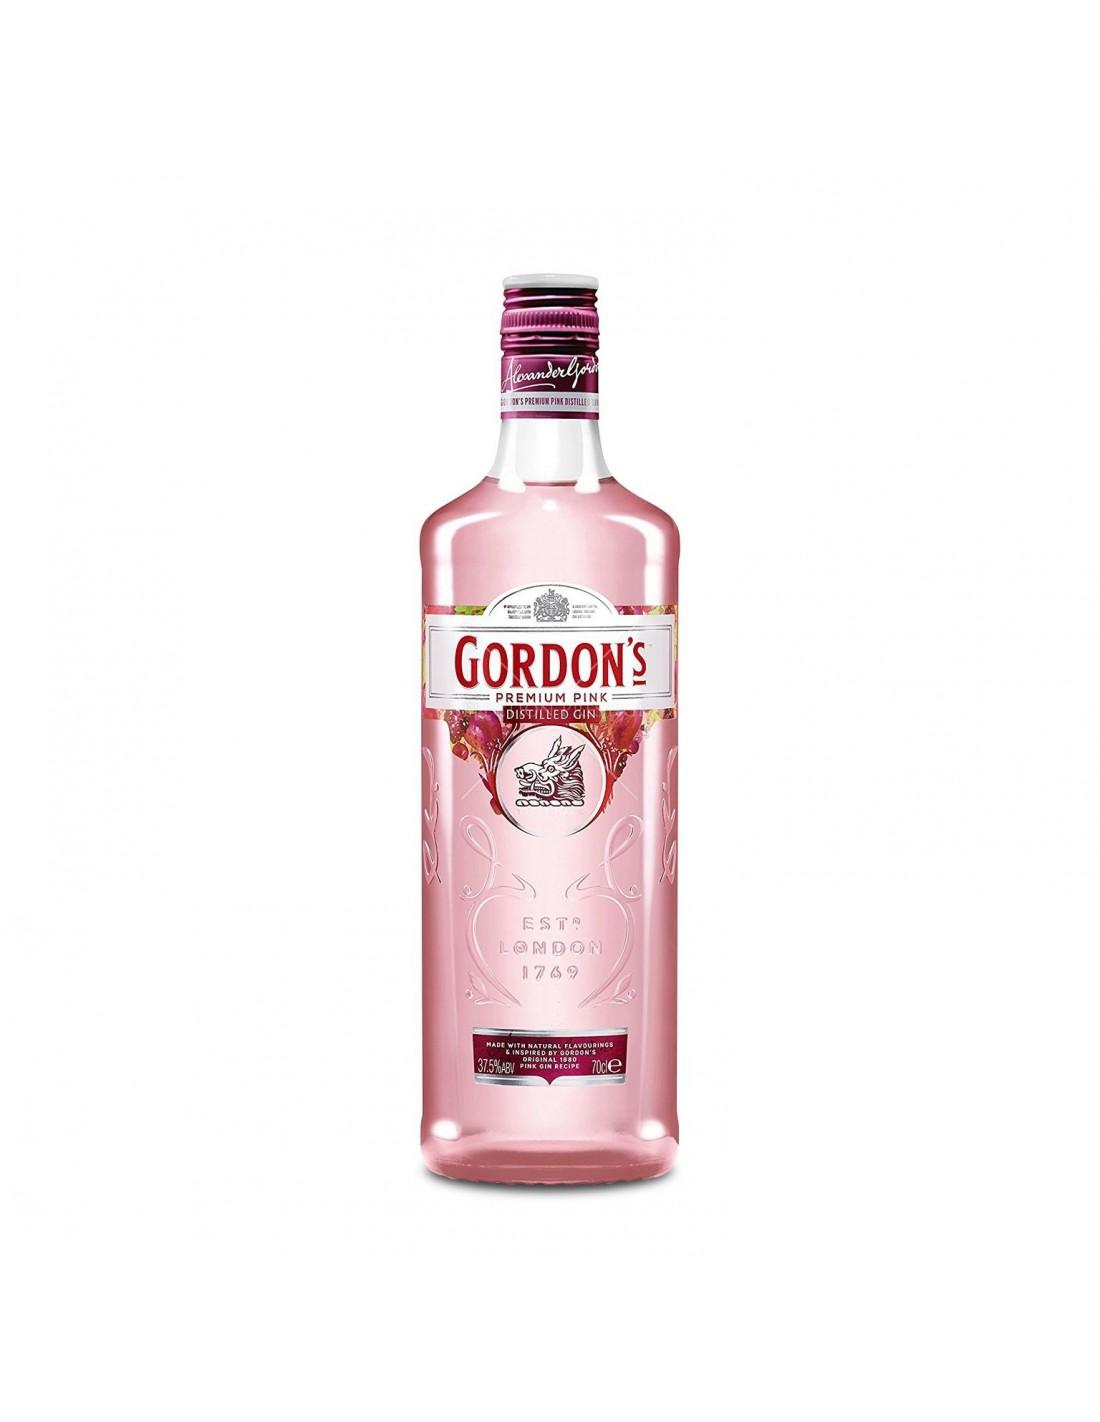 Gin Gordon's Pink Dry 37.5% alc., 0.7L, Anglia